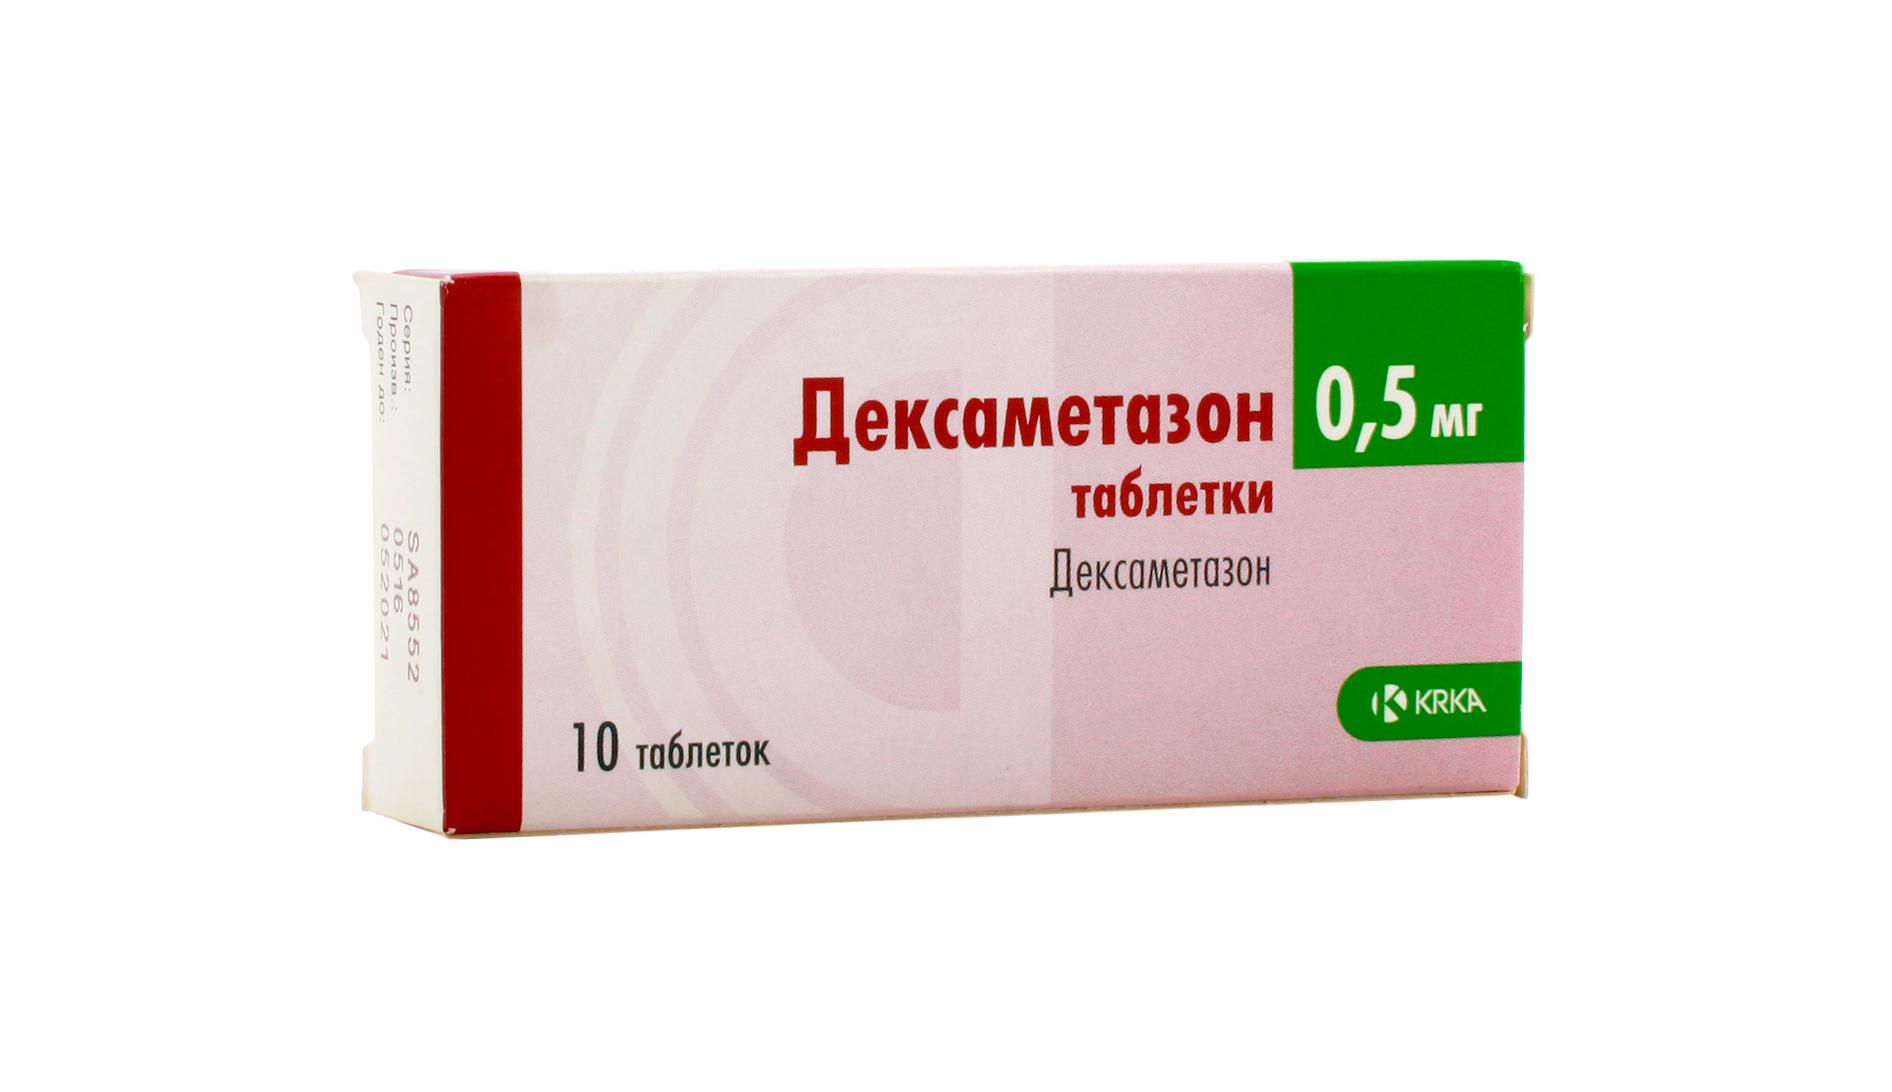 Дексаметазон (dexamethasone).